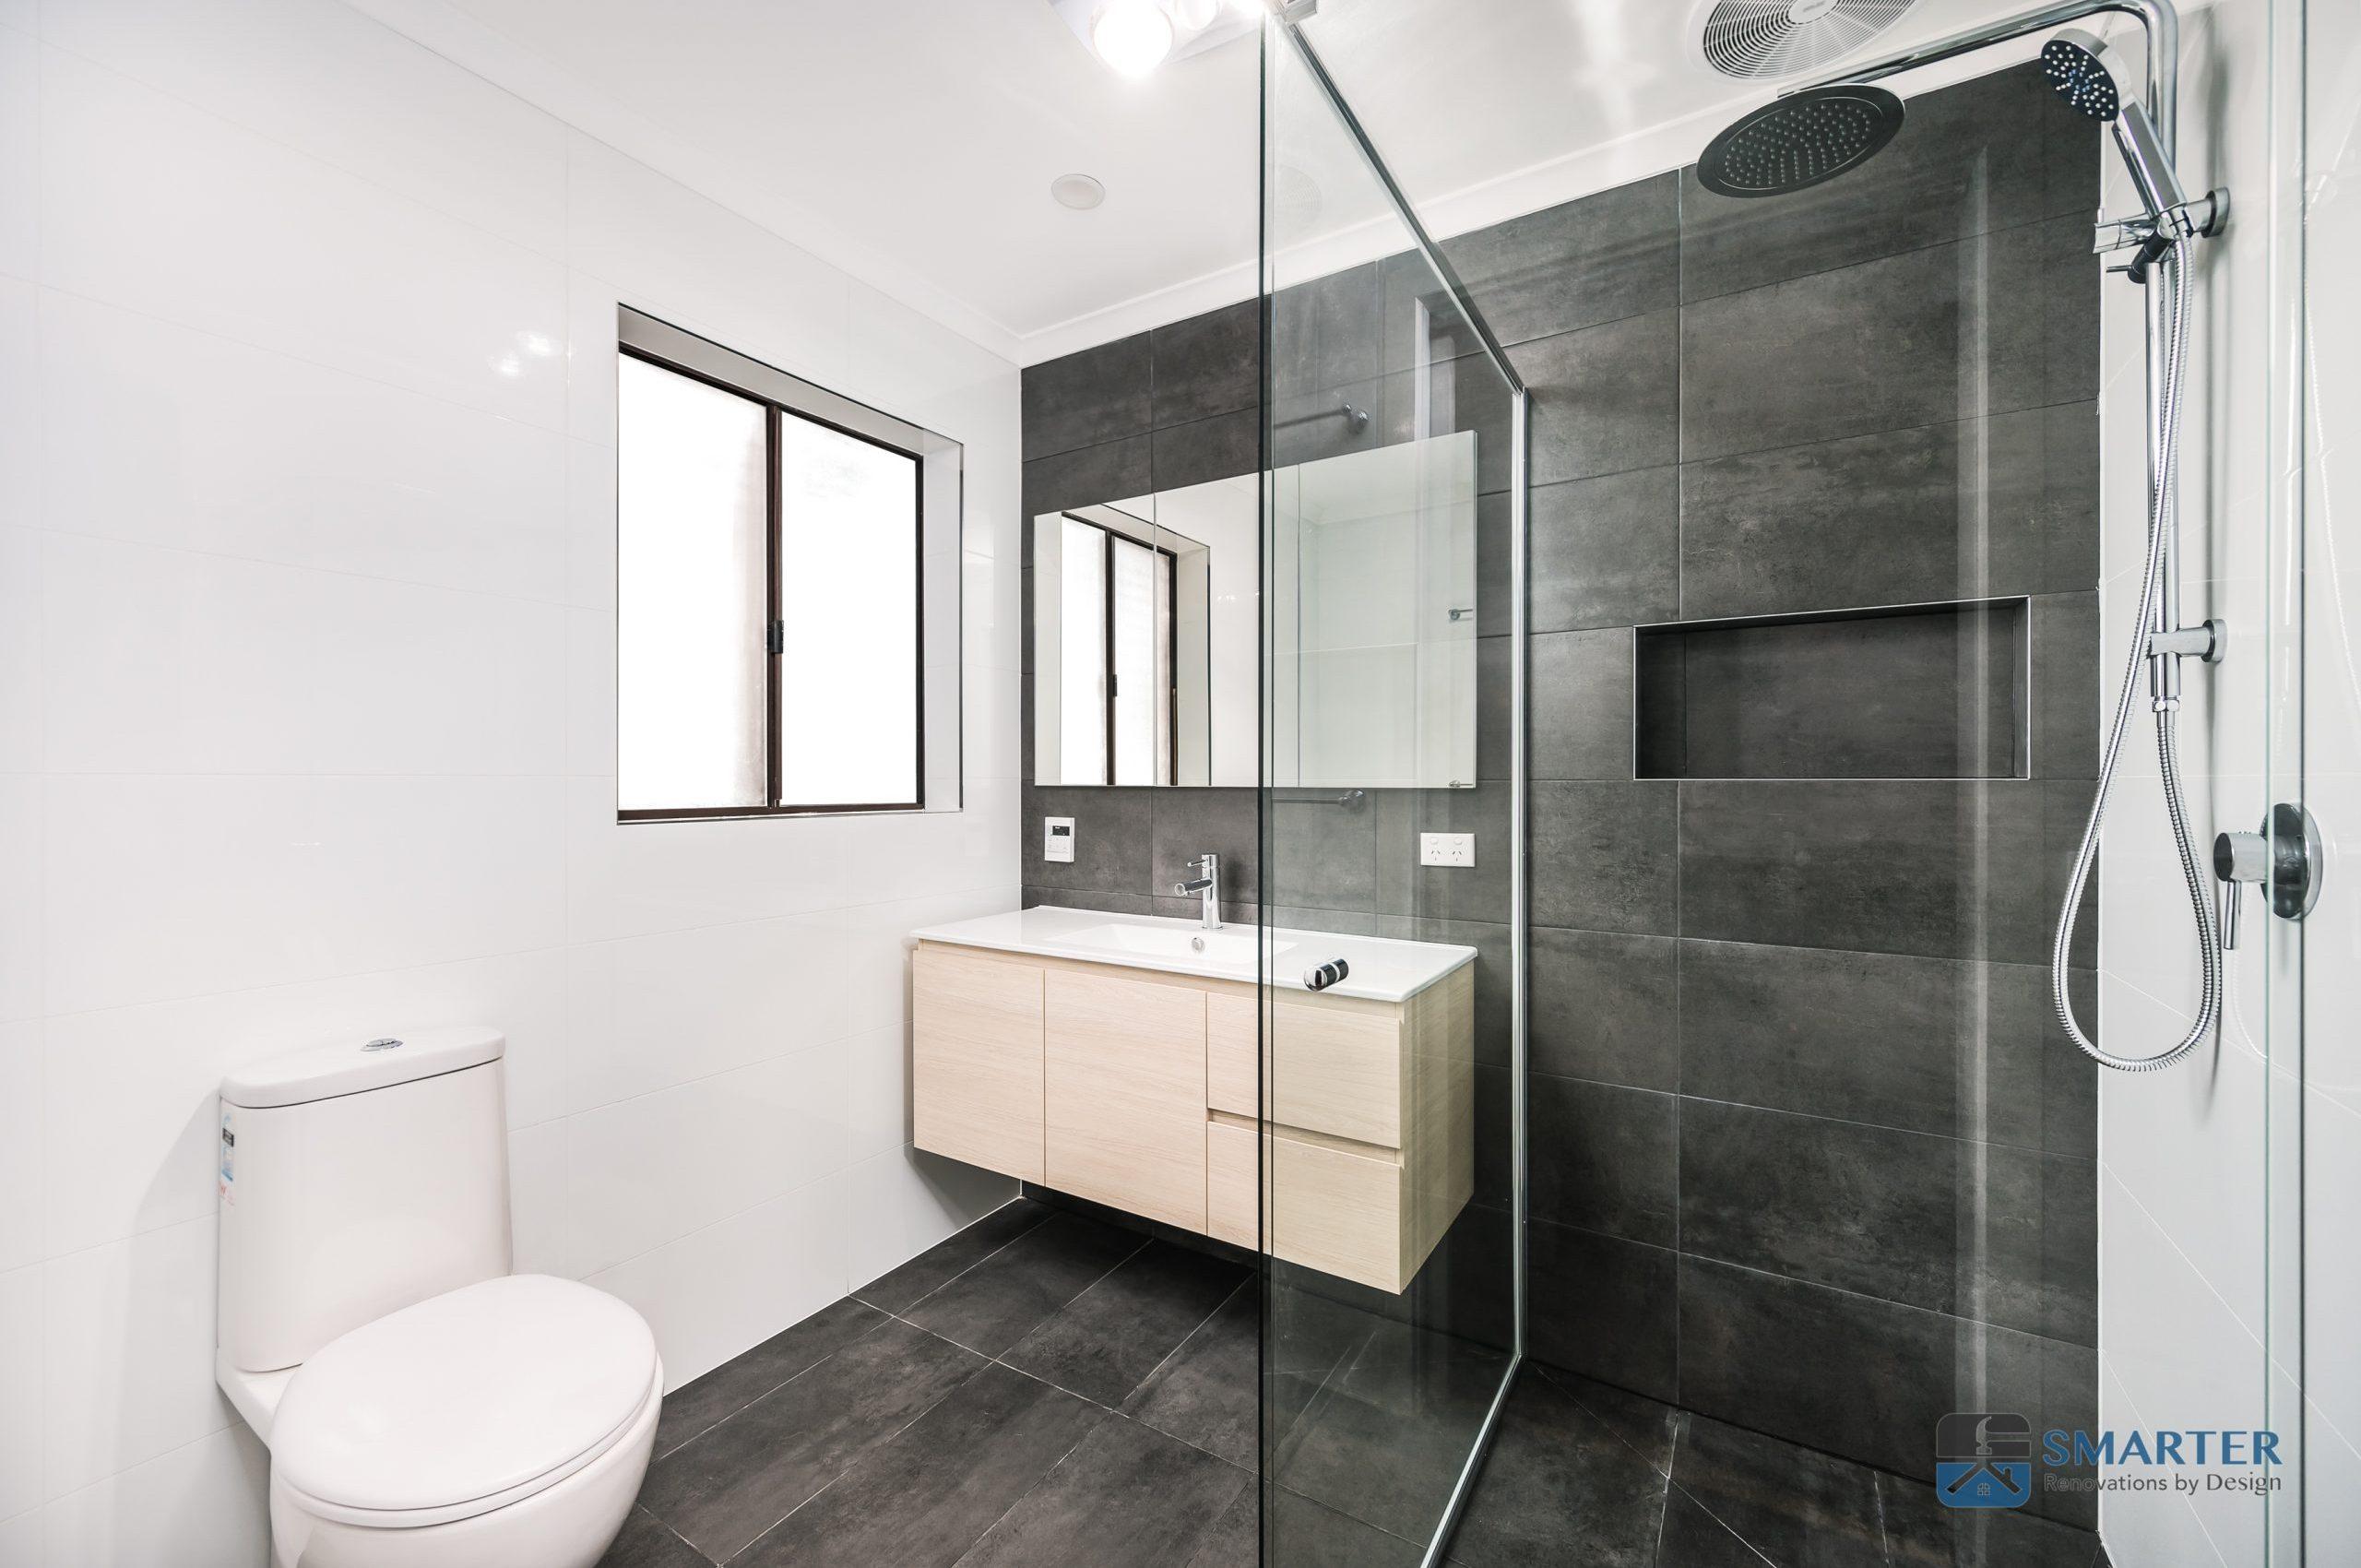 Bathroom Renovations Near Me